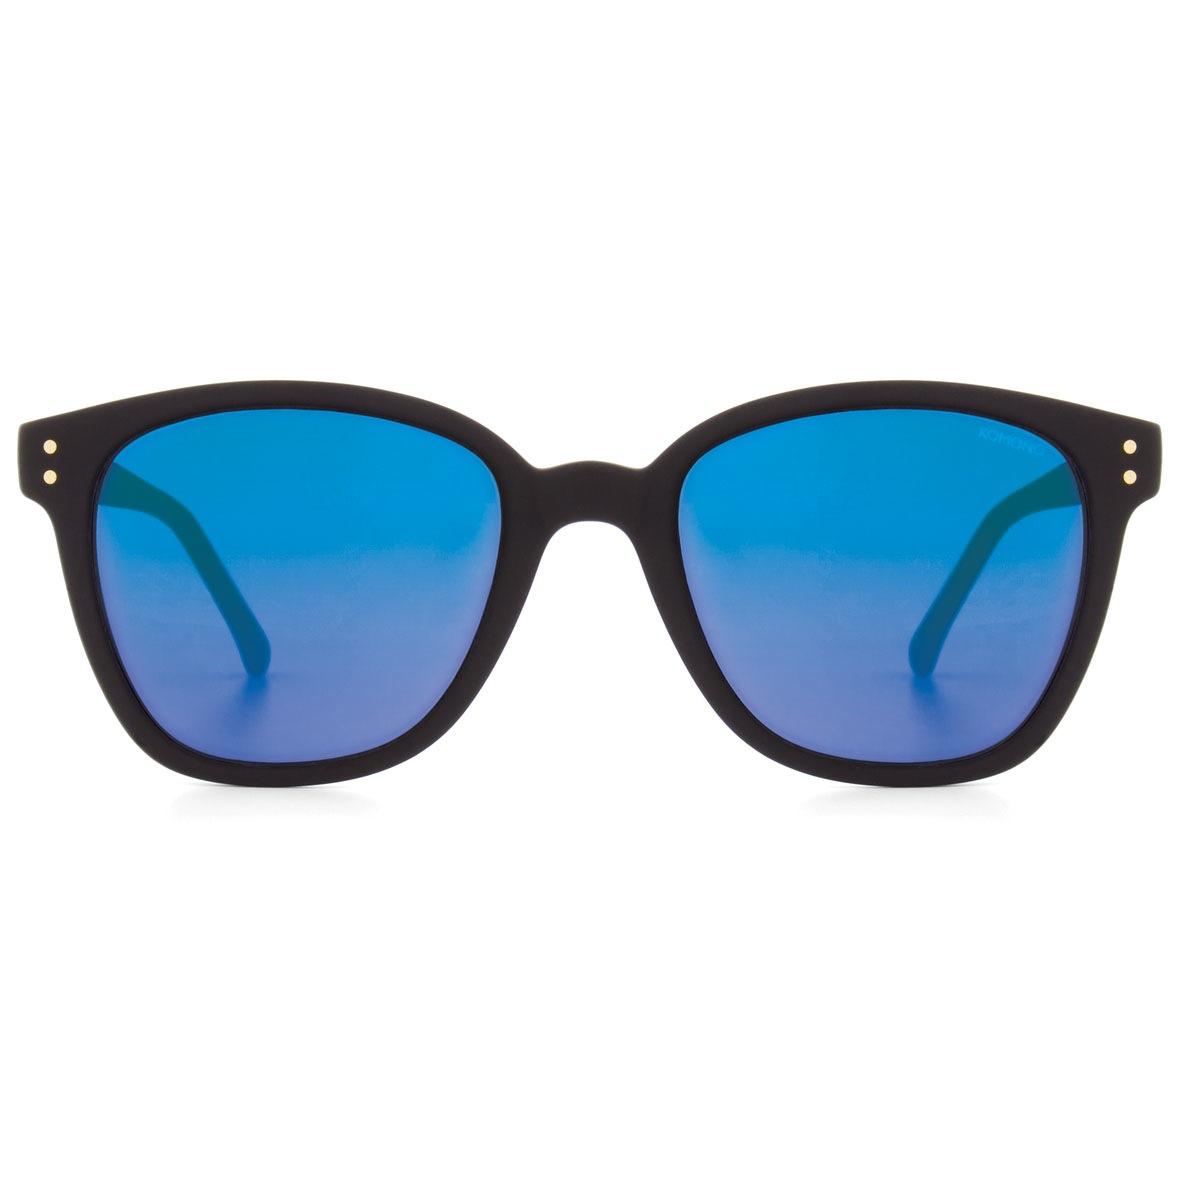 Солнцезащитные очки Komono Renee Black Rubber Blue Mirror